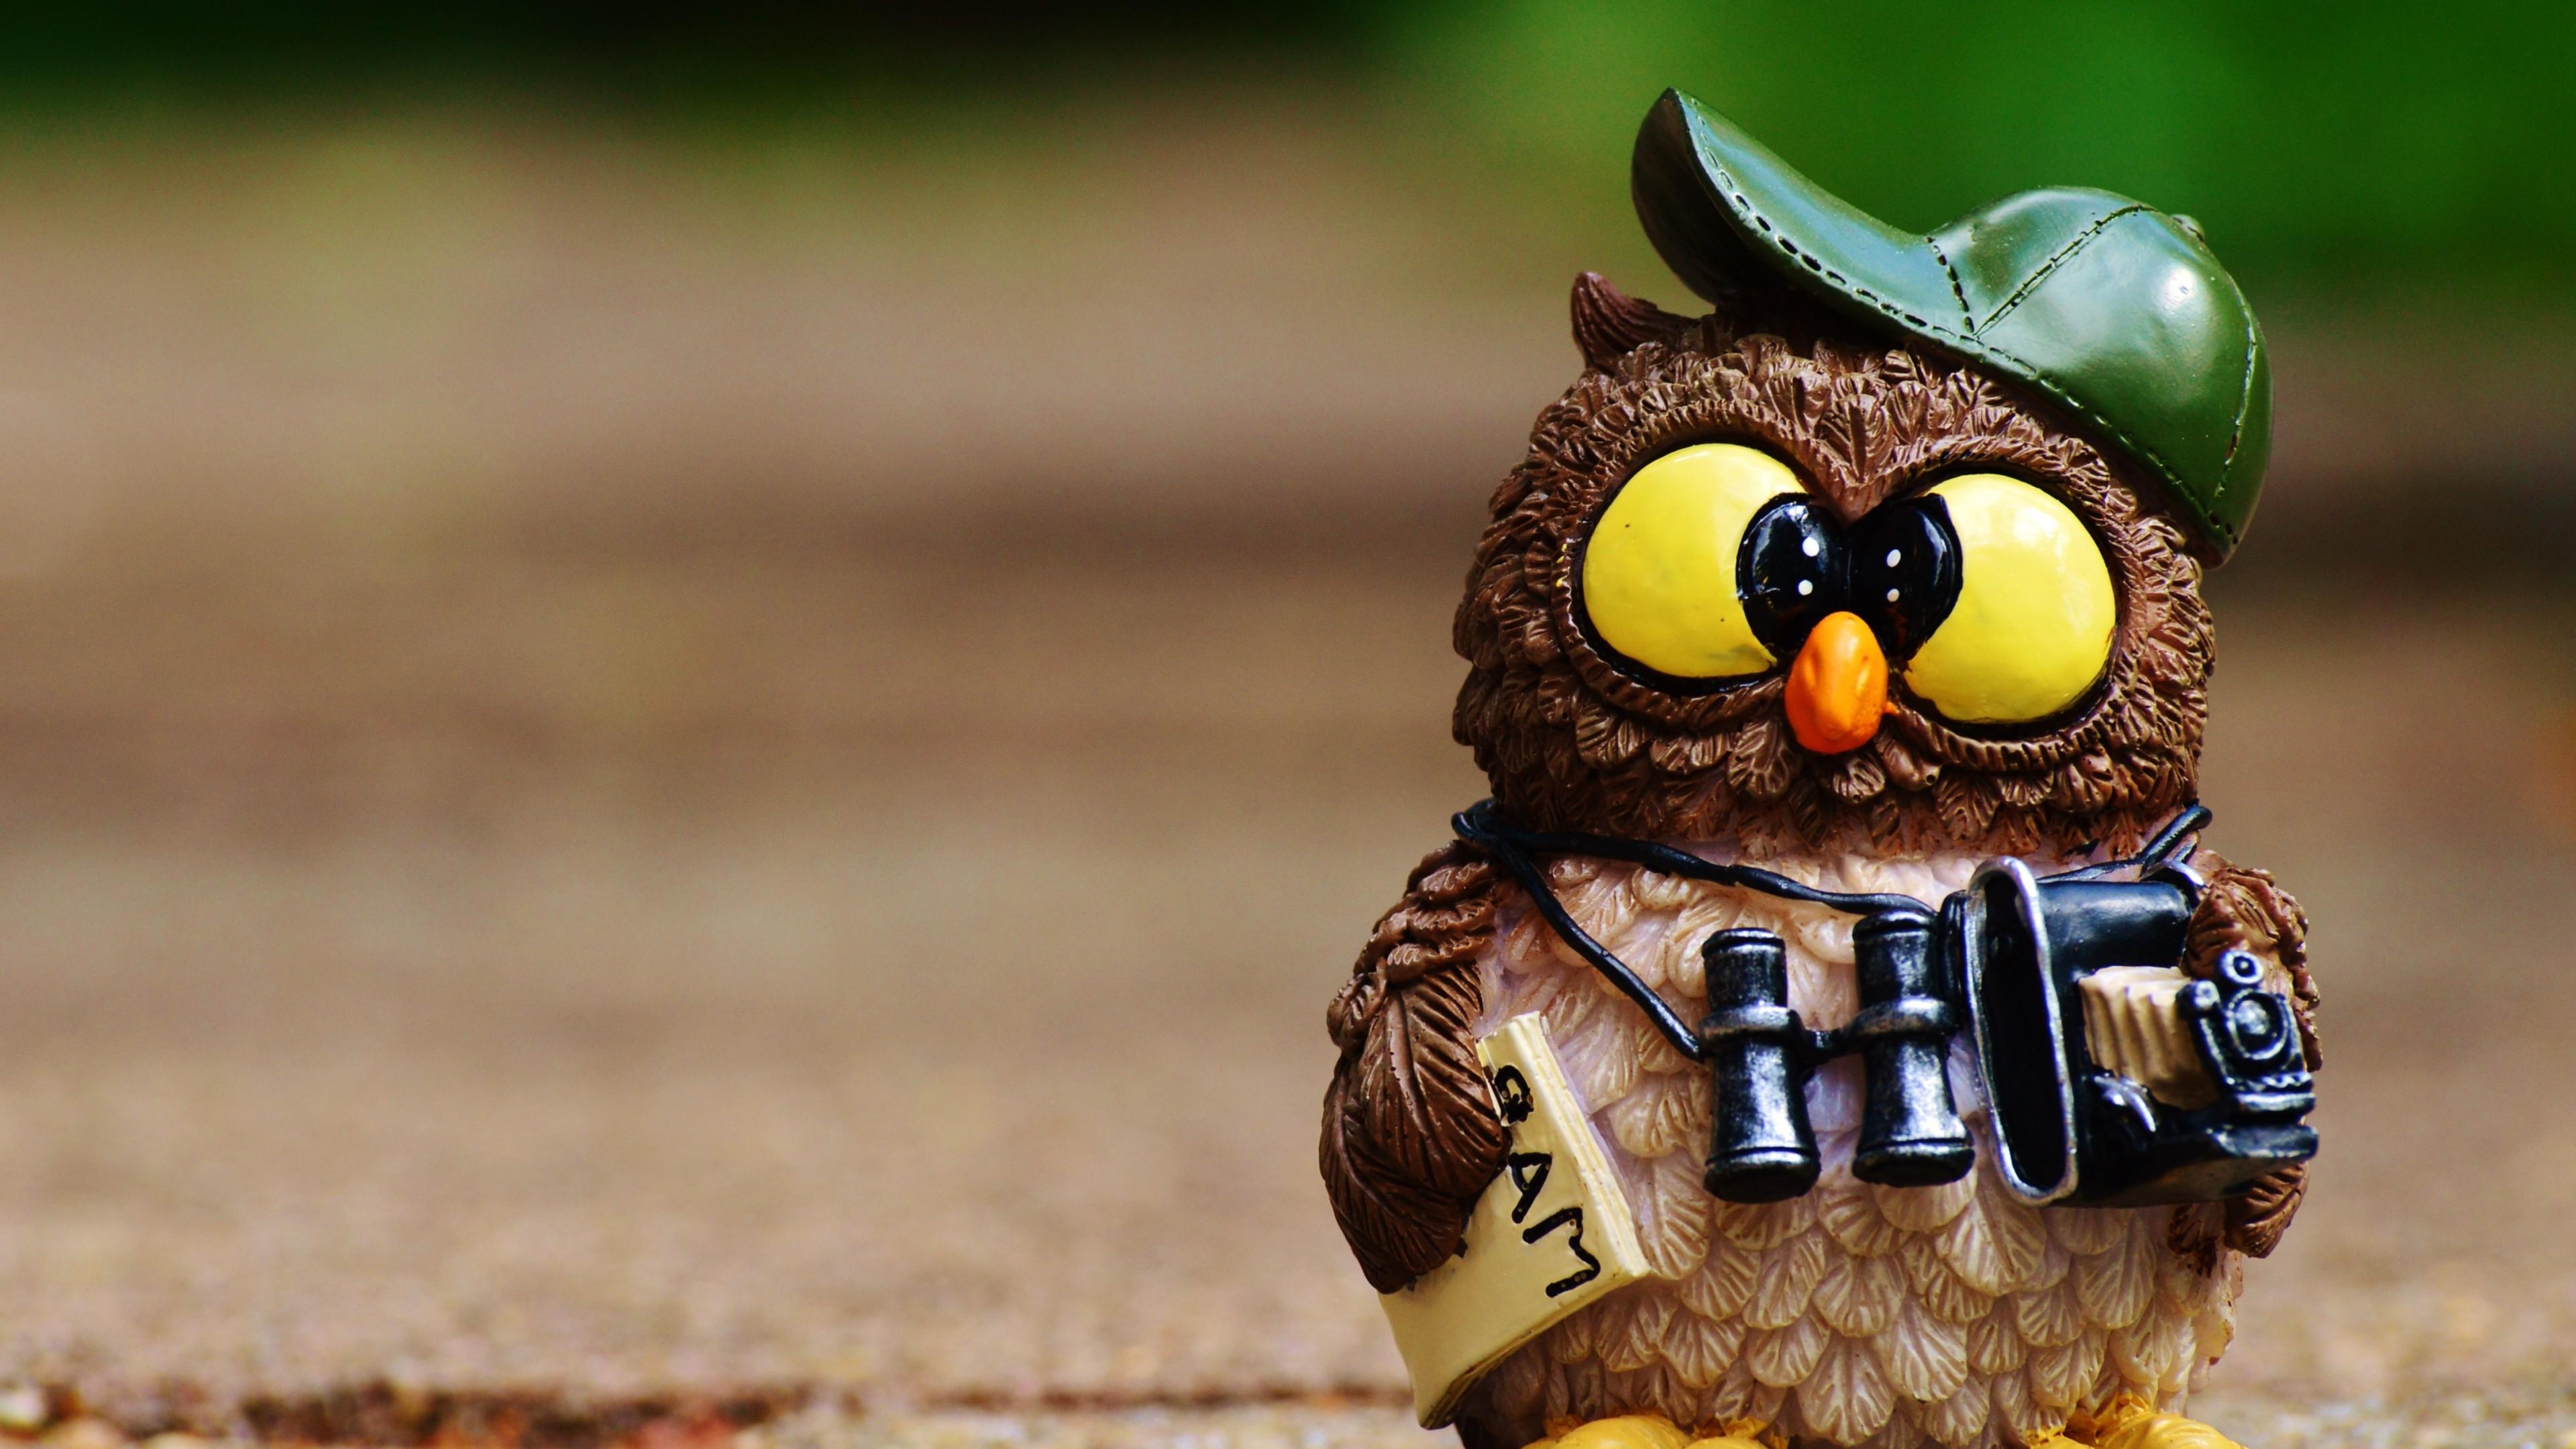 Hintergrundbilder  px tiere fernglas vögel kamera